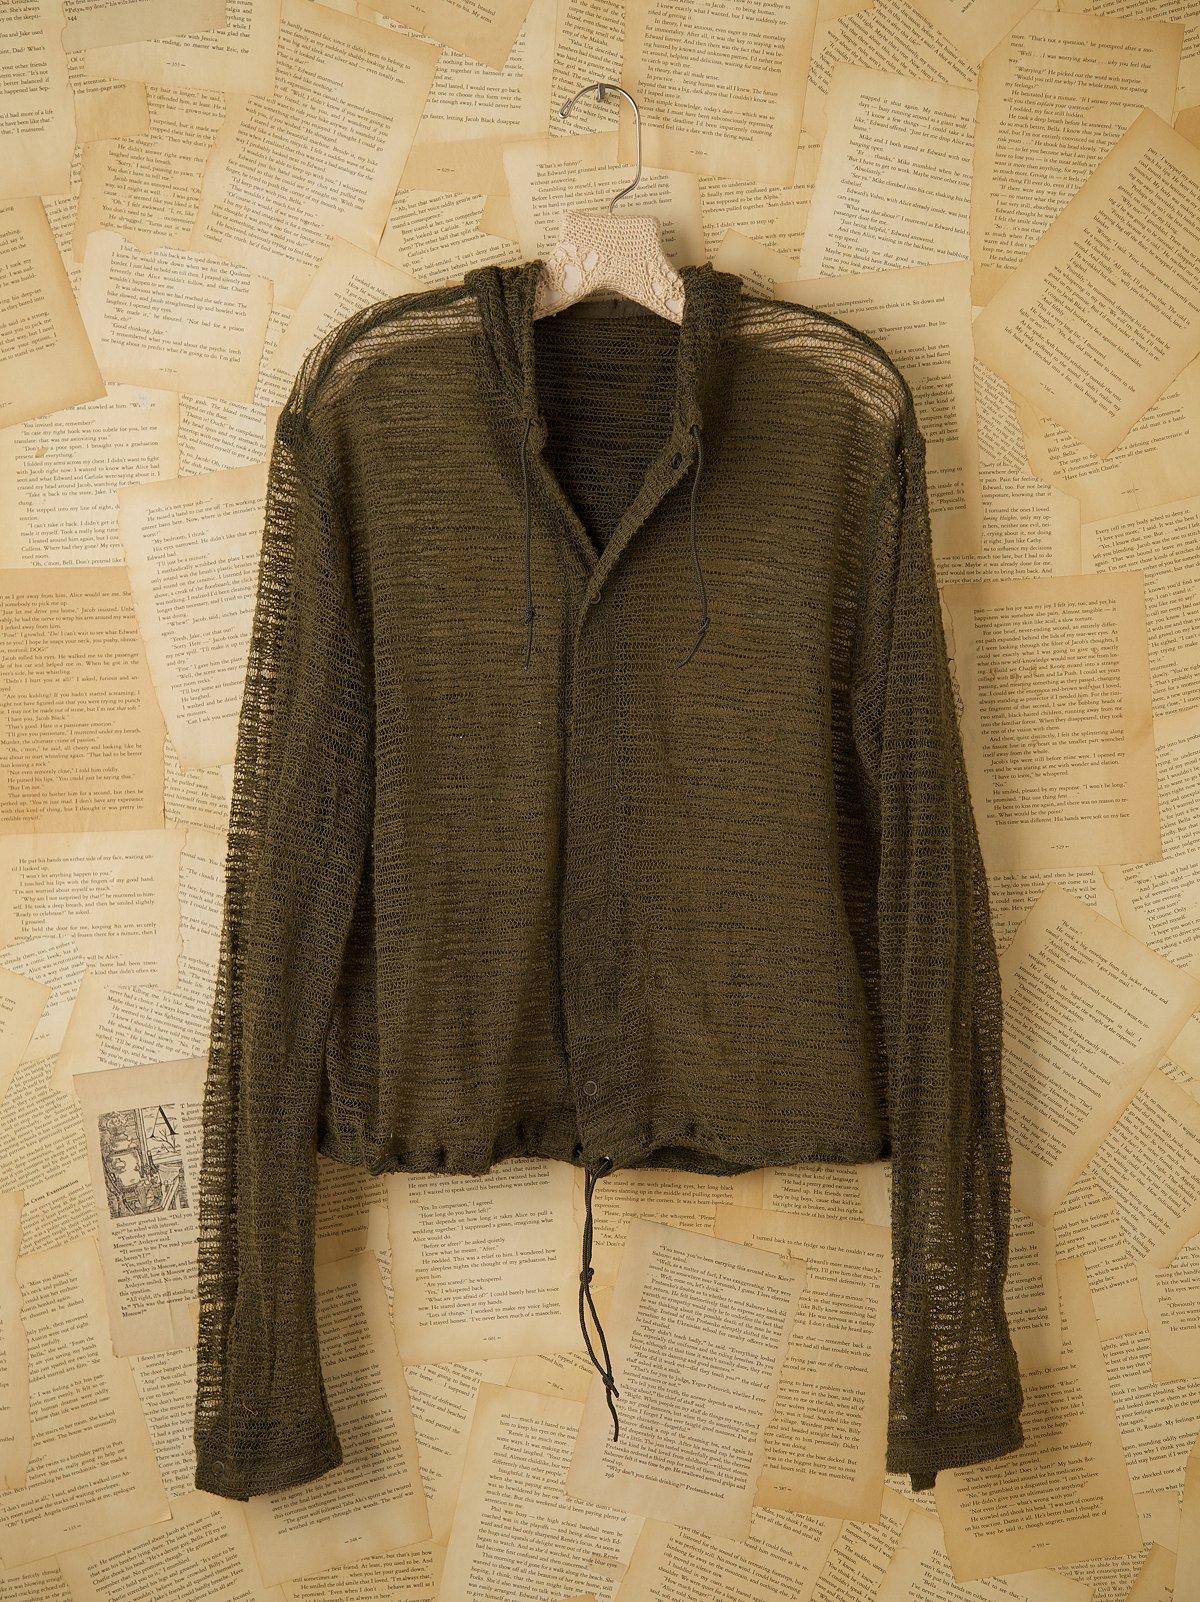 Vintage Mosquito Net Jacket